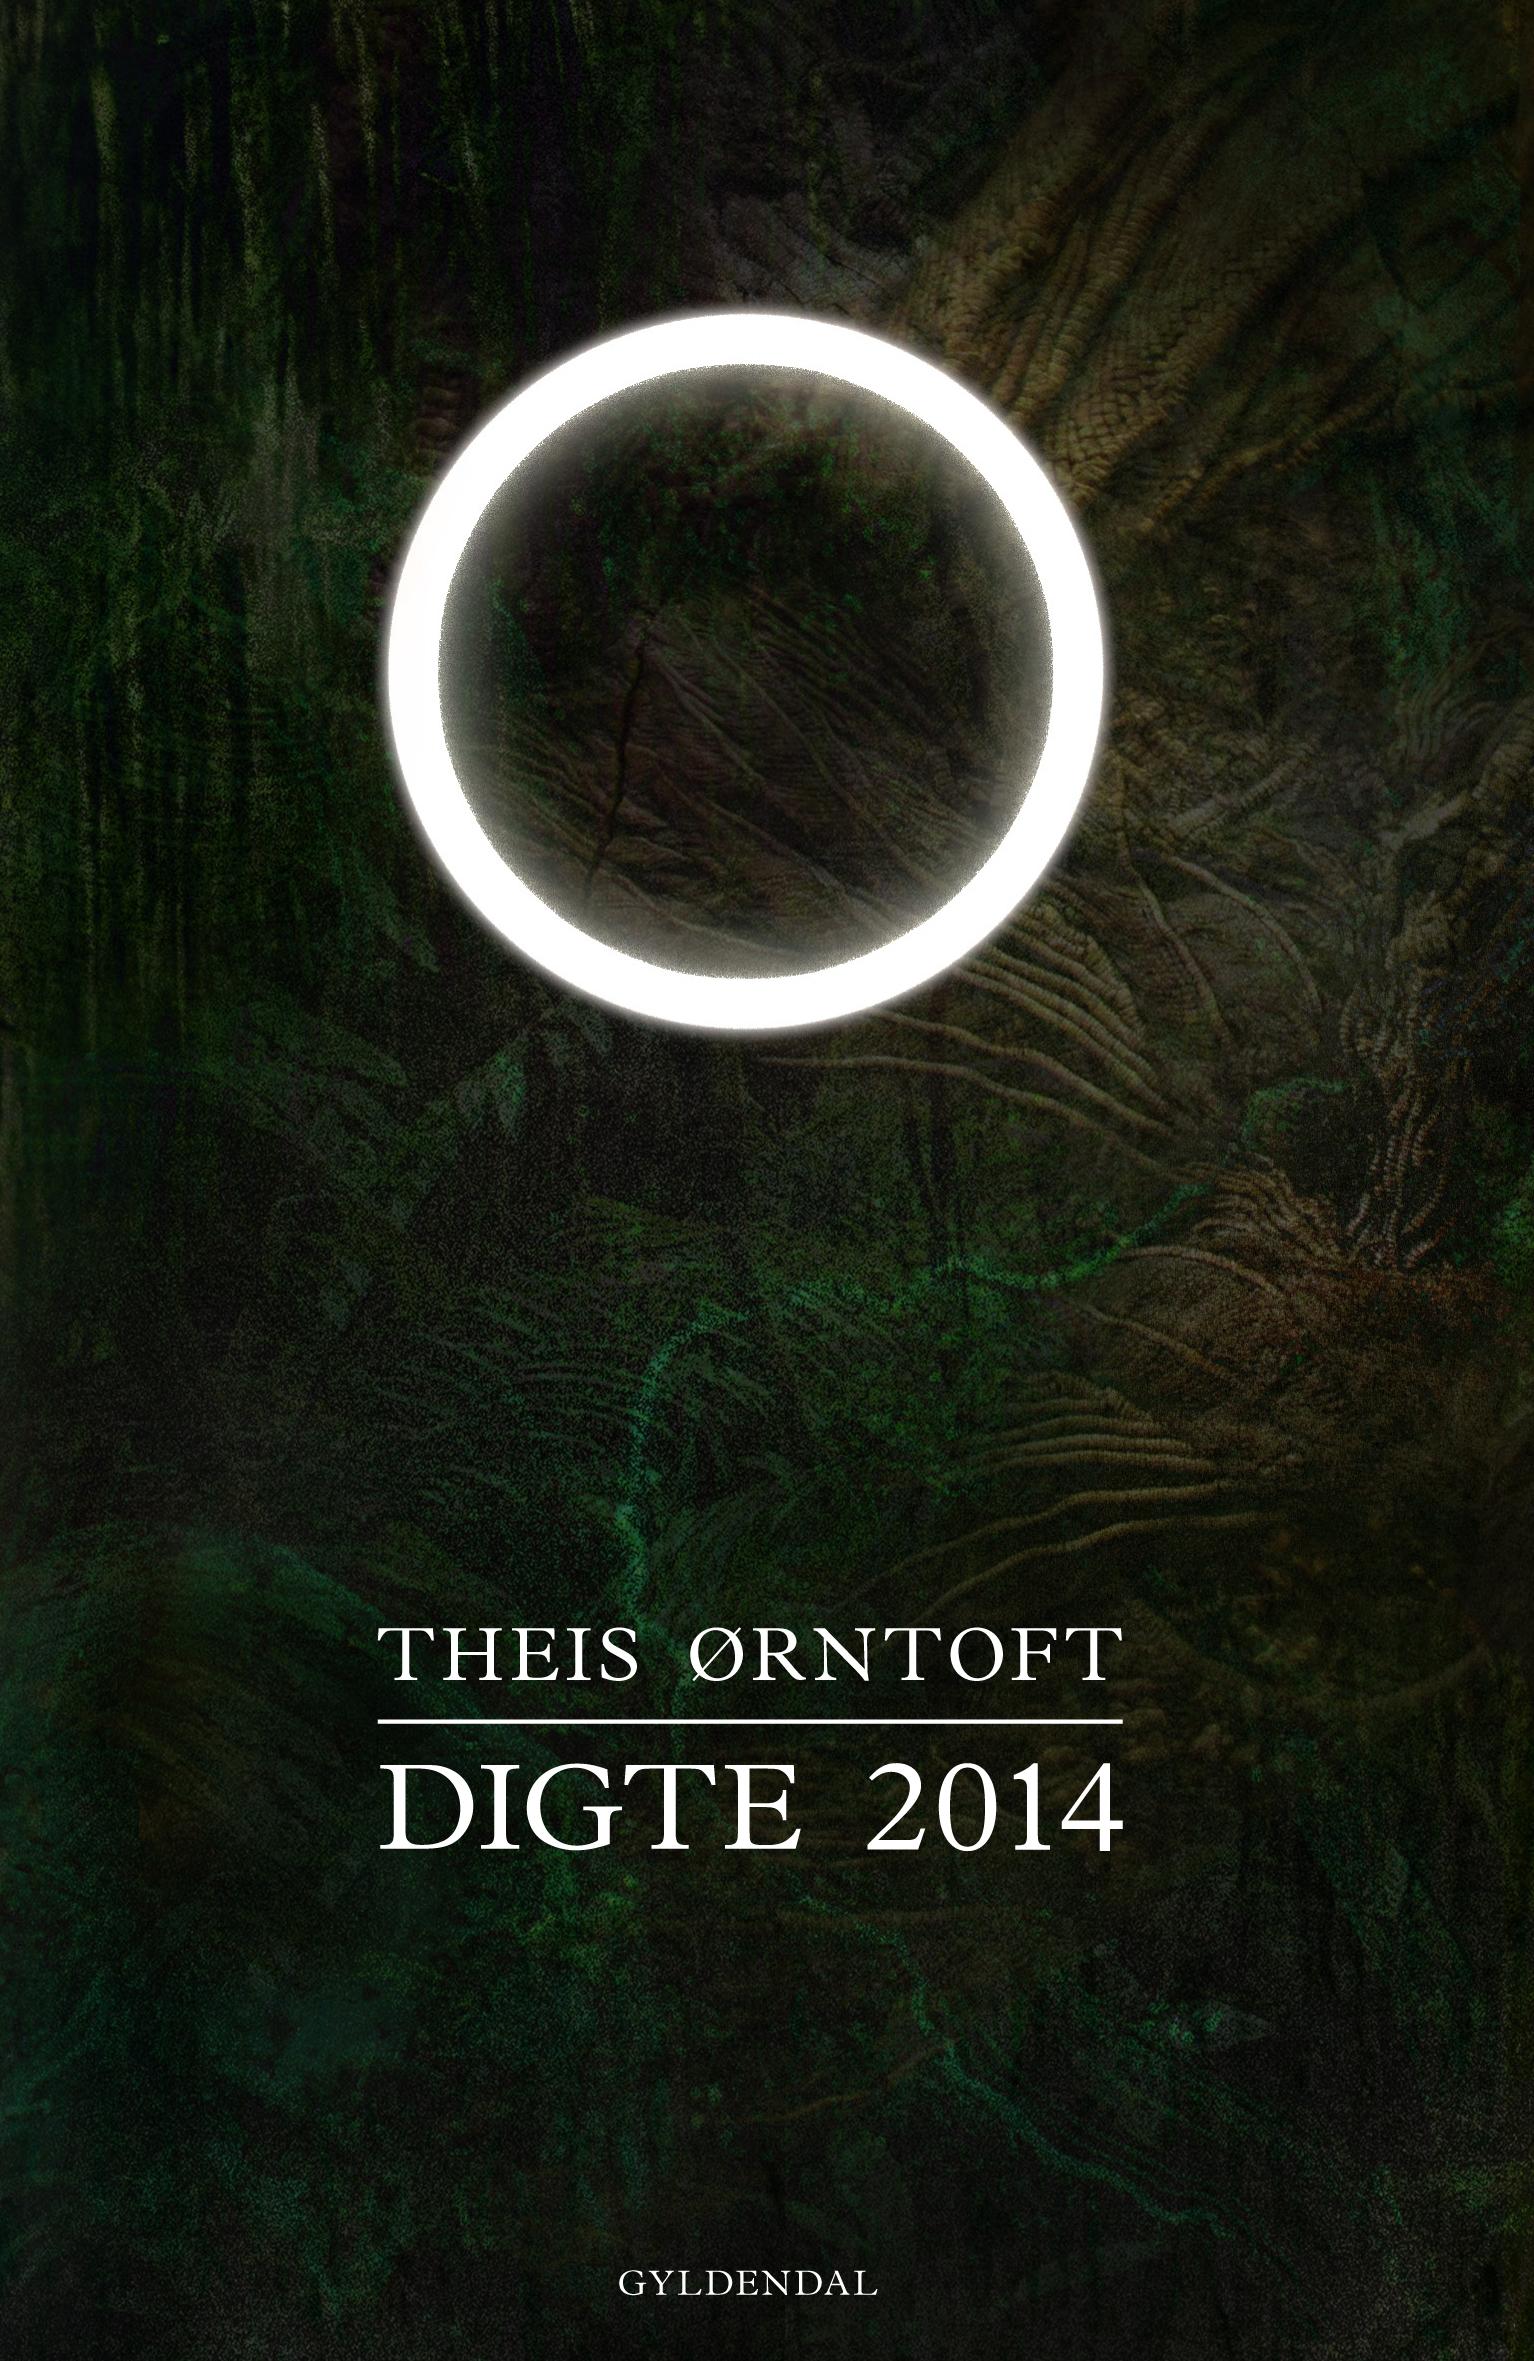 Theis Ørntofts Digte 2014 (2014).